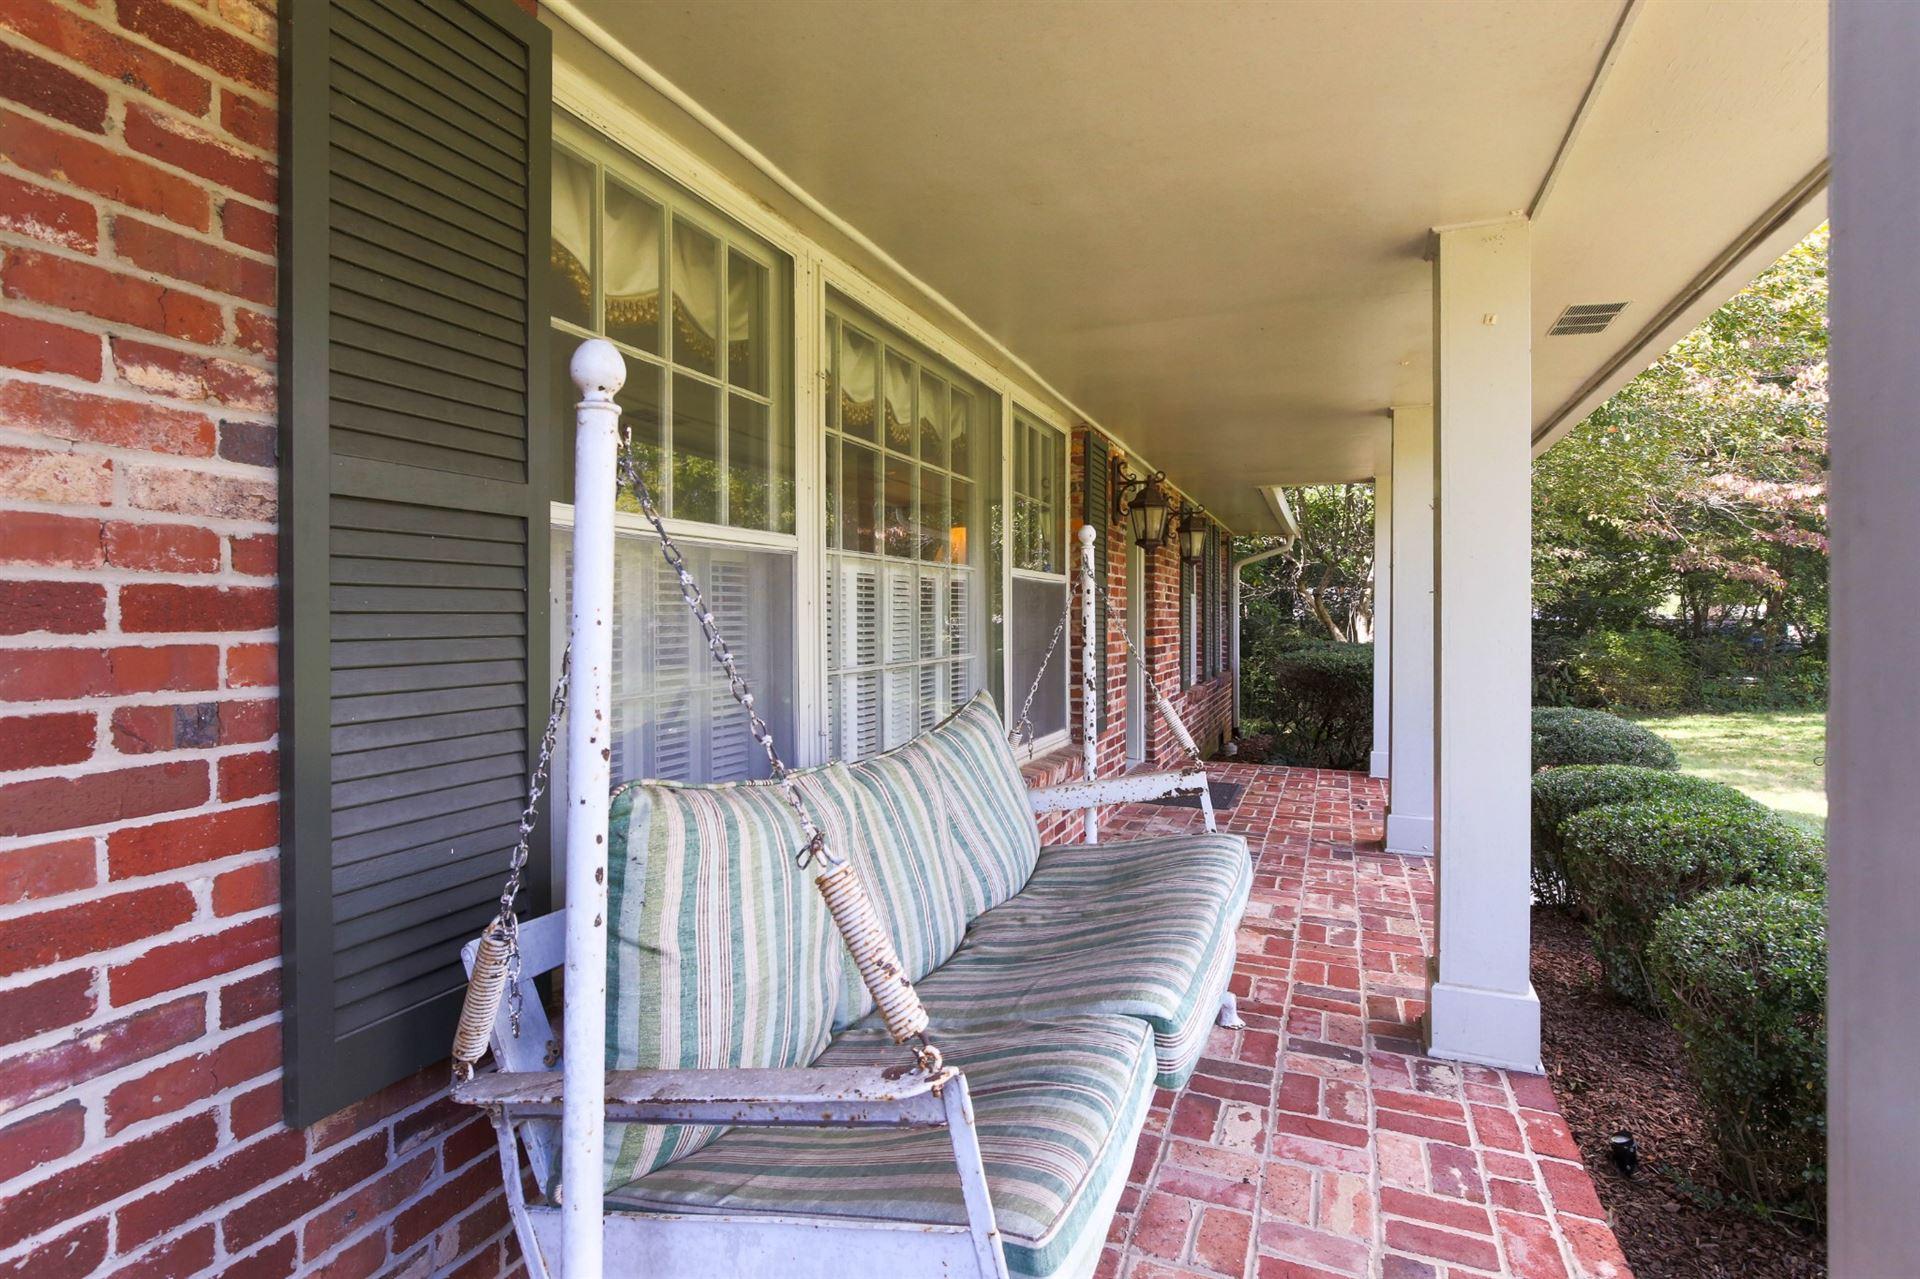 Photo of 1102 Virginia Ave, Murfreesboro, TN 37130 (MLS # 2299867)